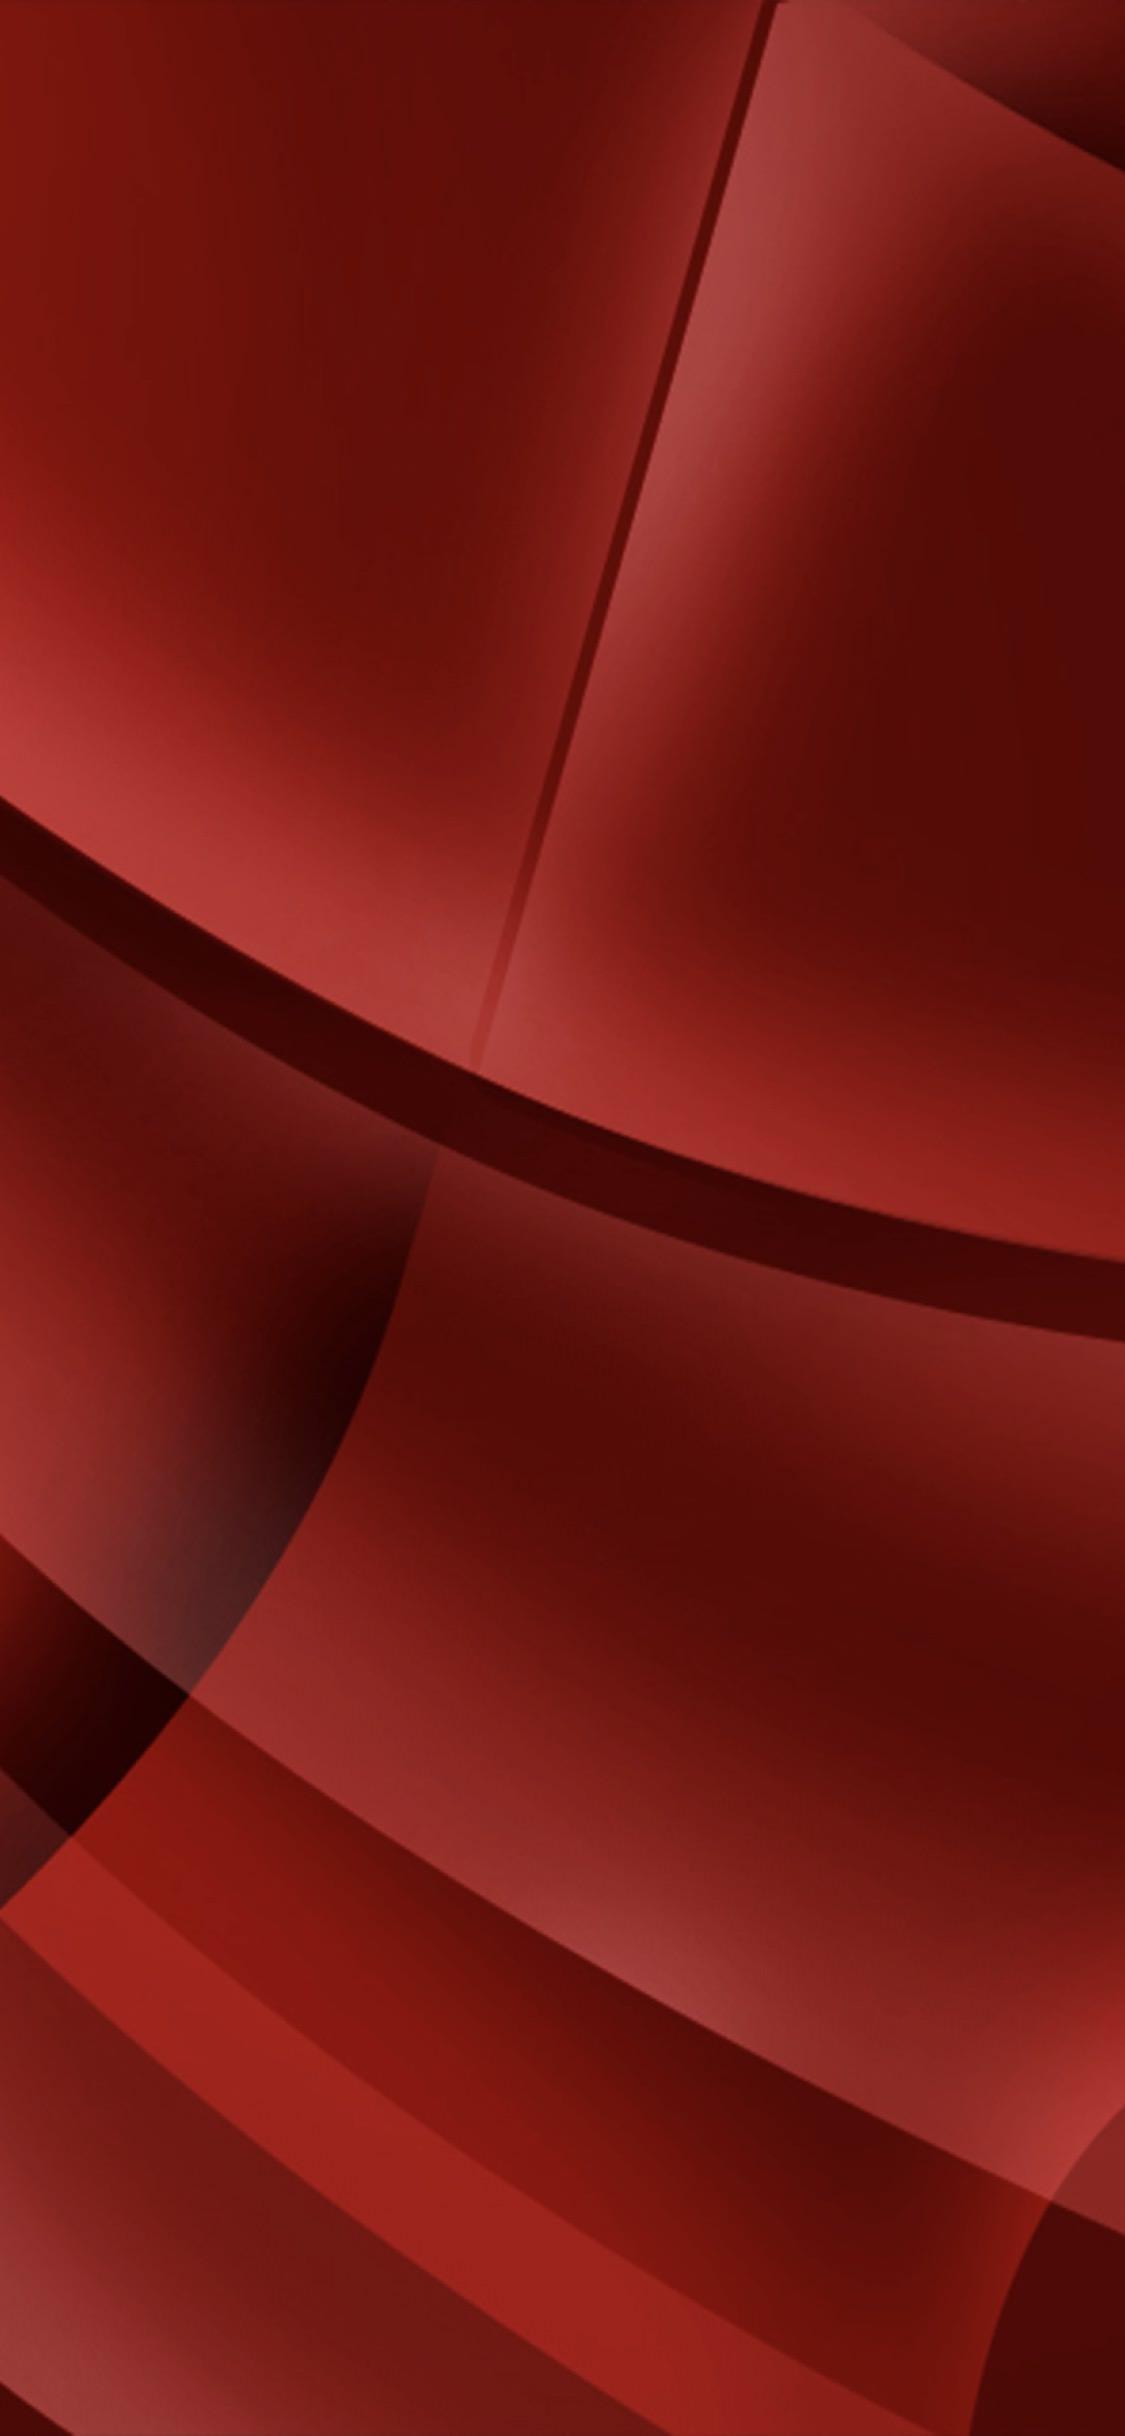 iPhone XS , iPhone X 壁紙 0453